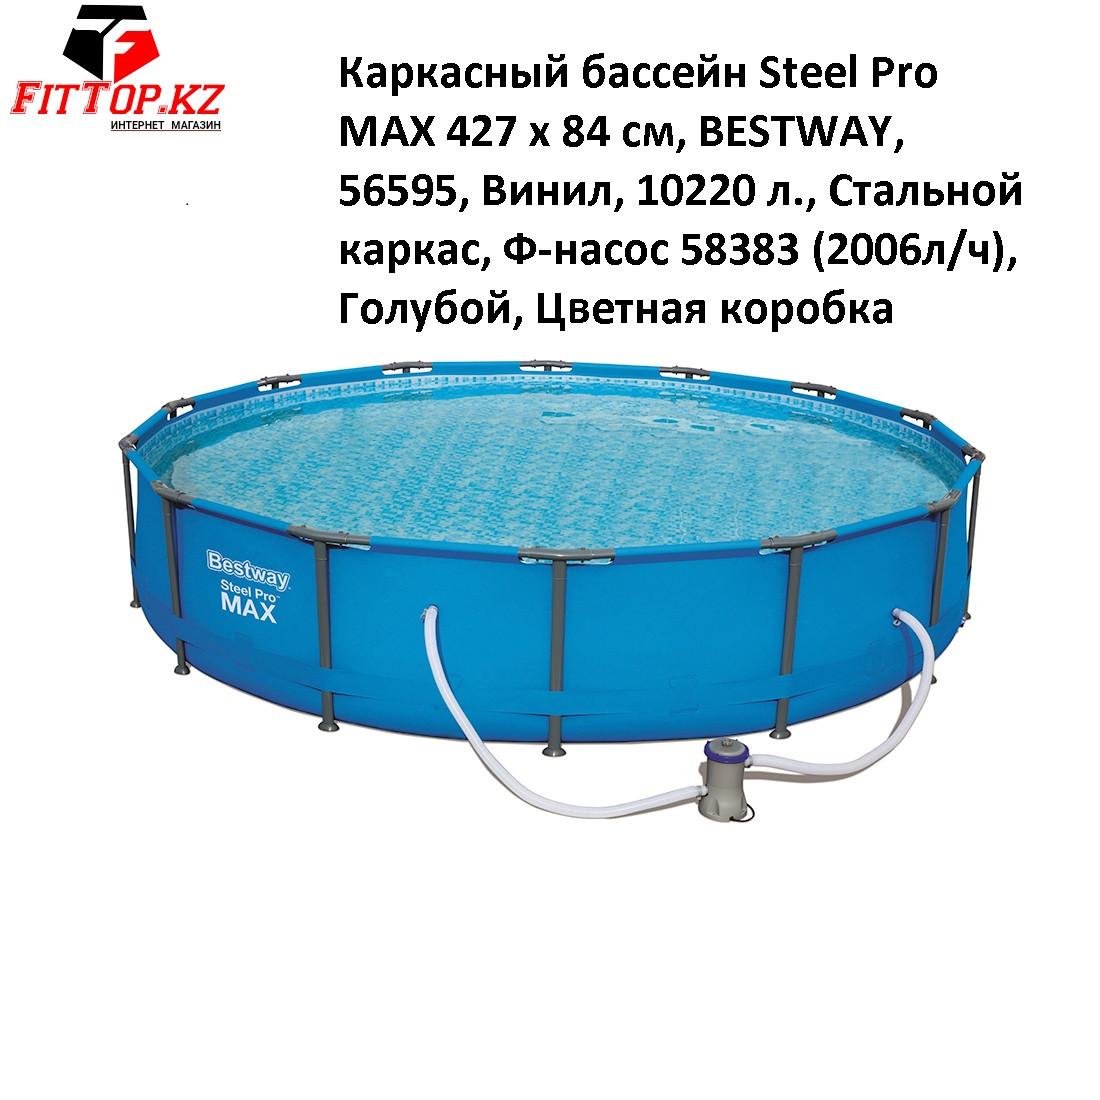 Каркасный бассейн Steel Pro MAX 427 х 84 см, BESTWAY, 56595, Винил, 10220 л